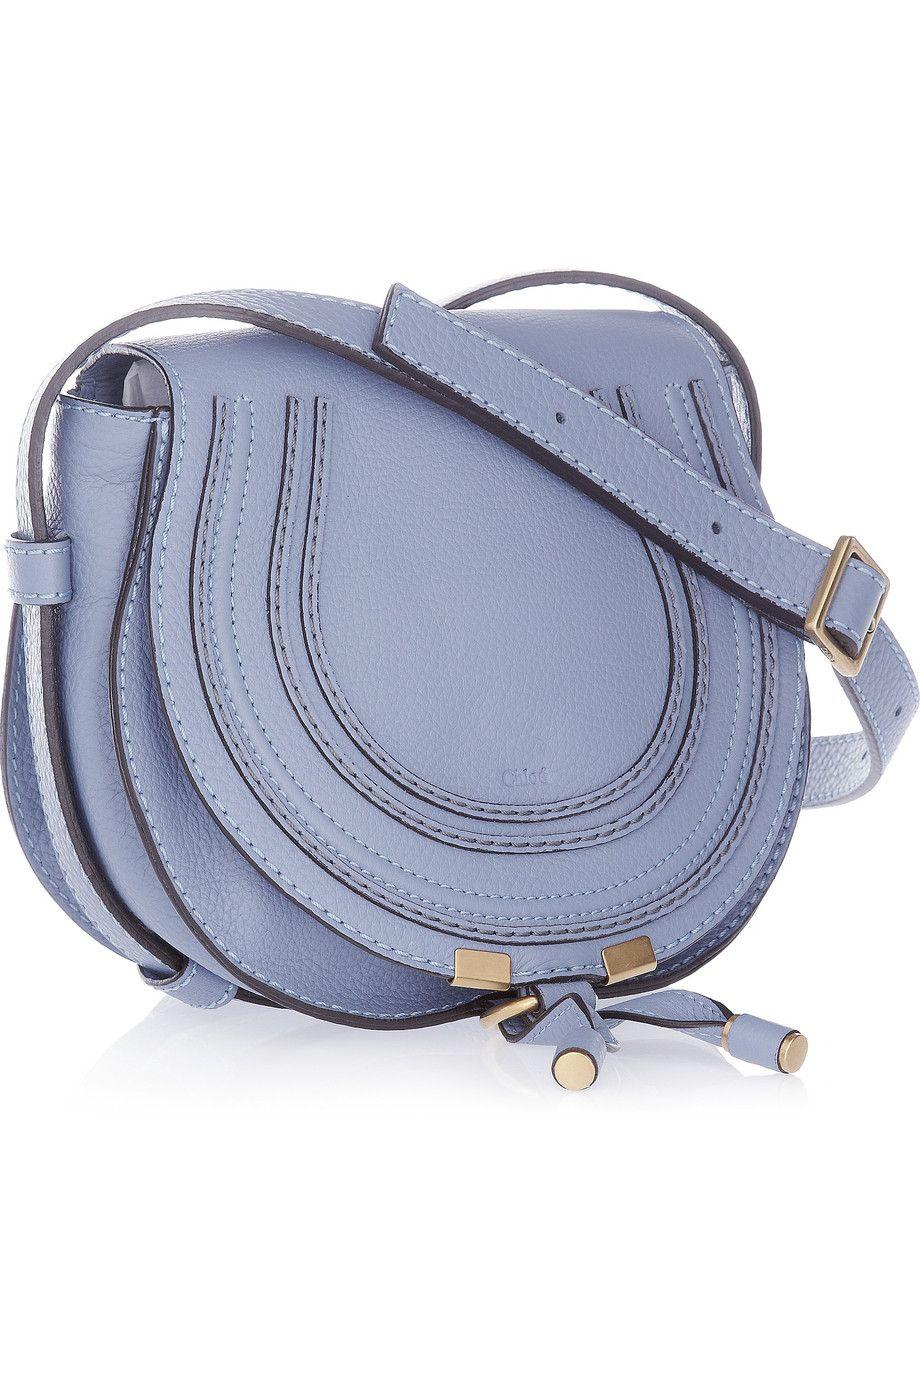 Chloé|Marcie Mini leather shoulder bag